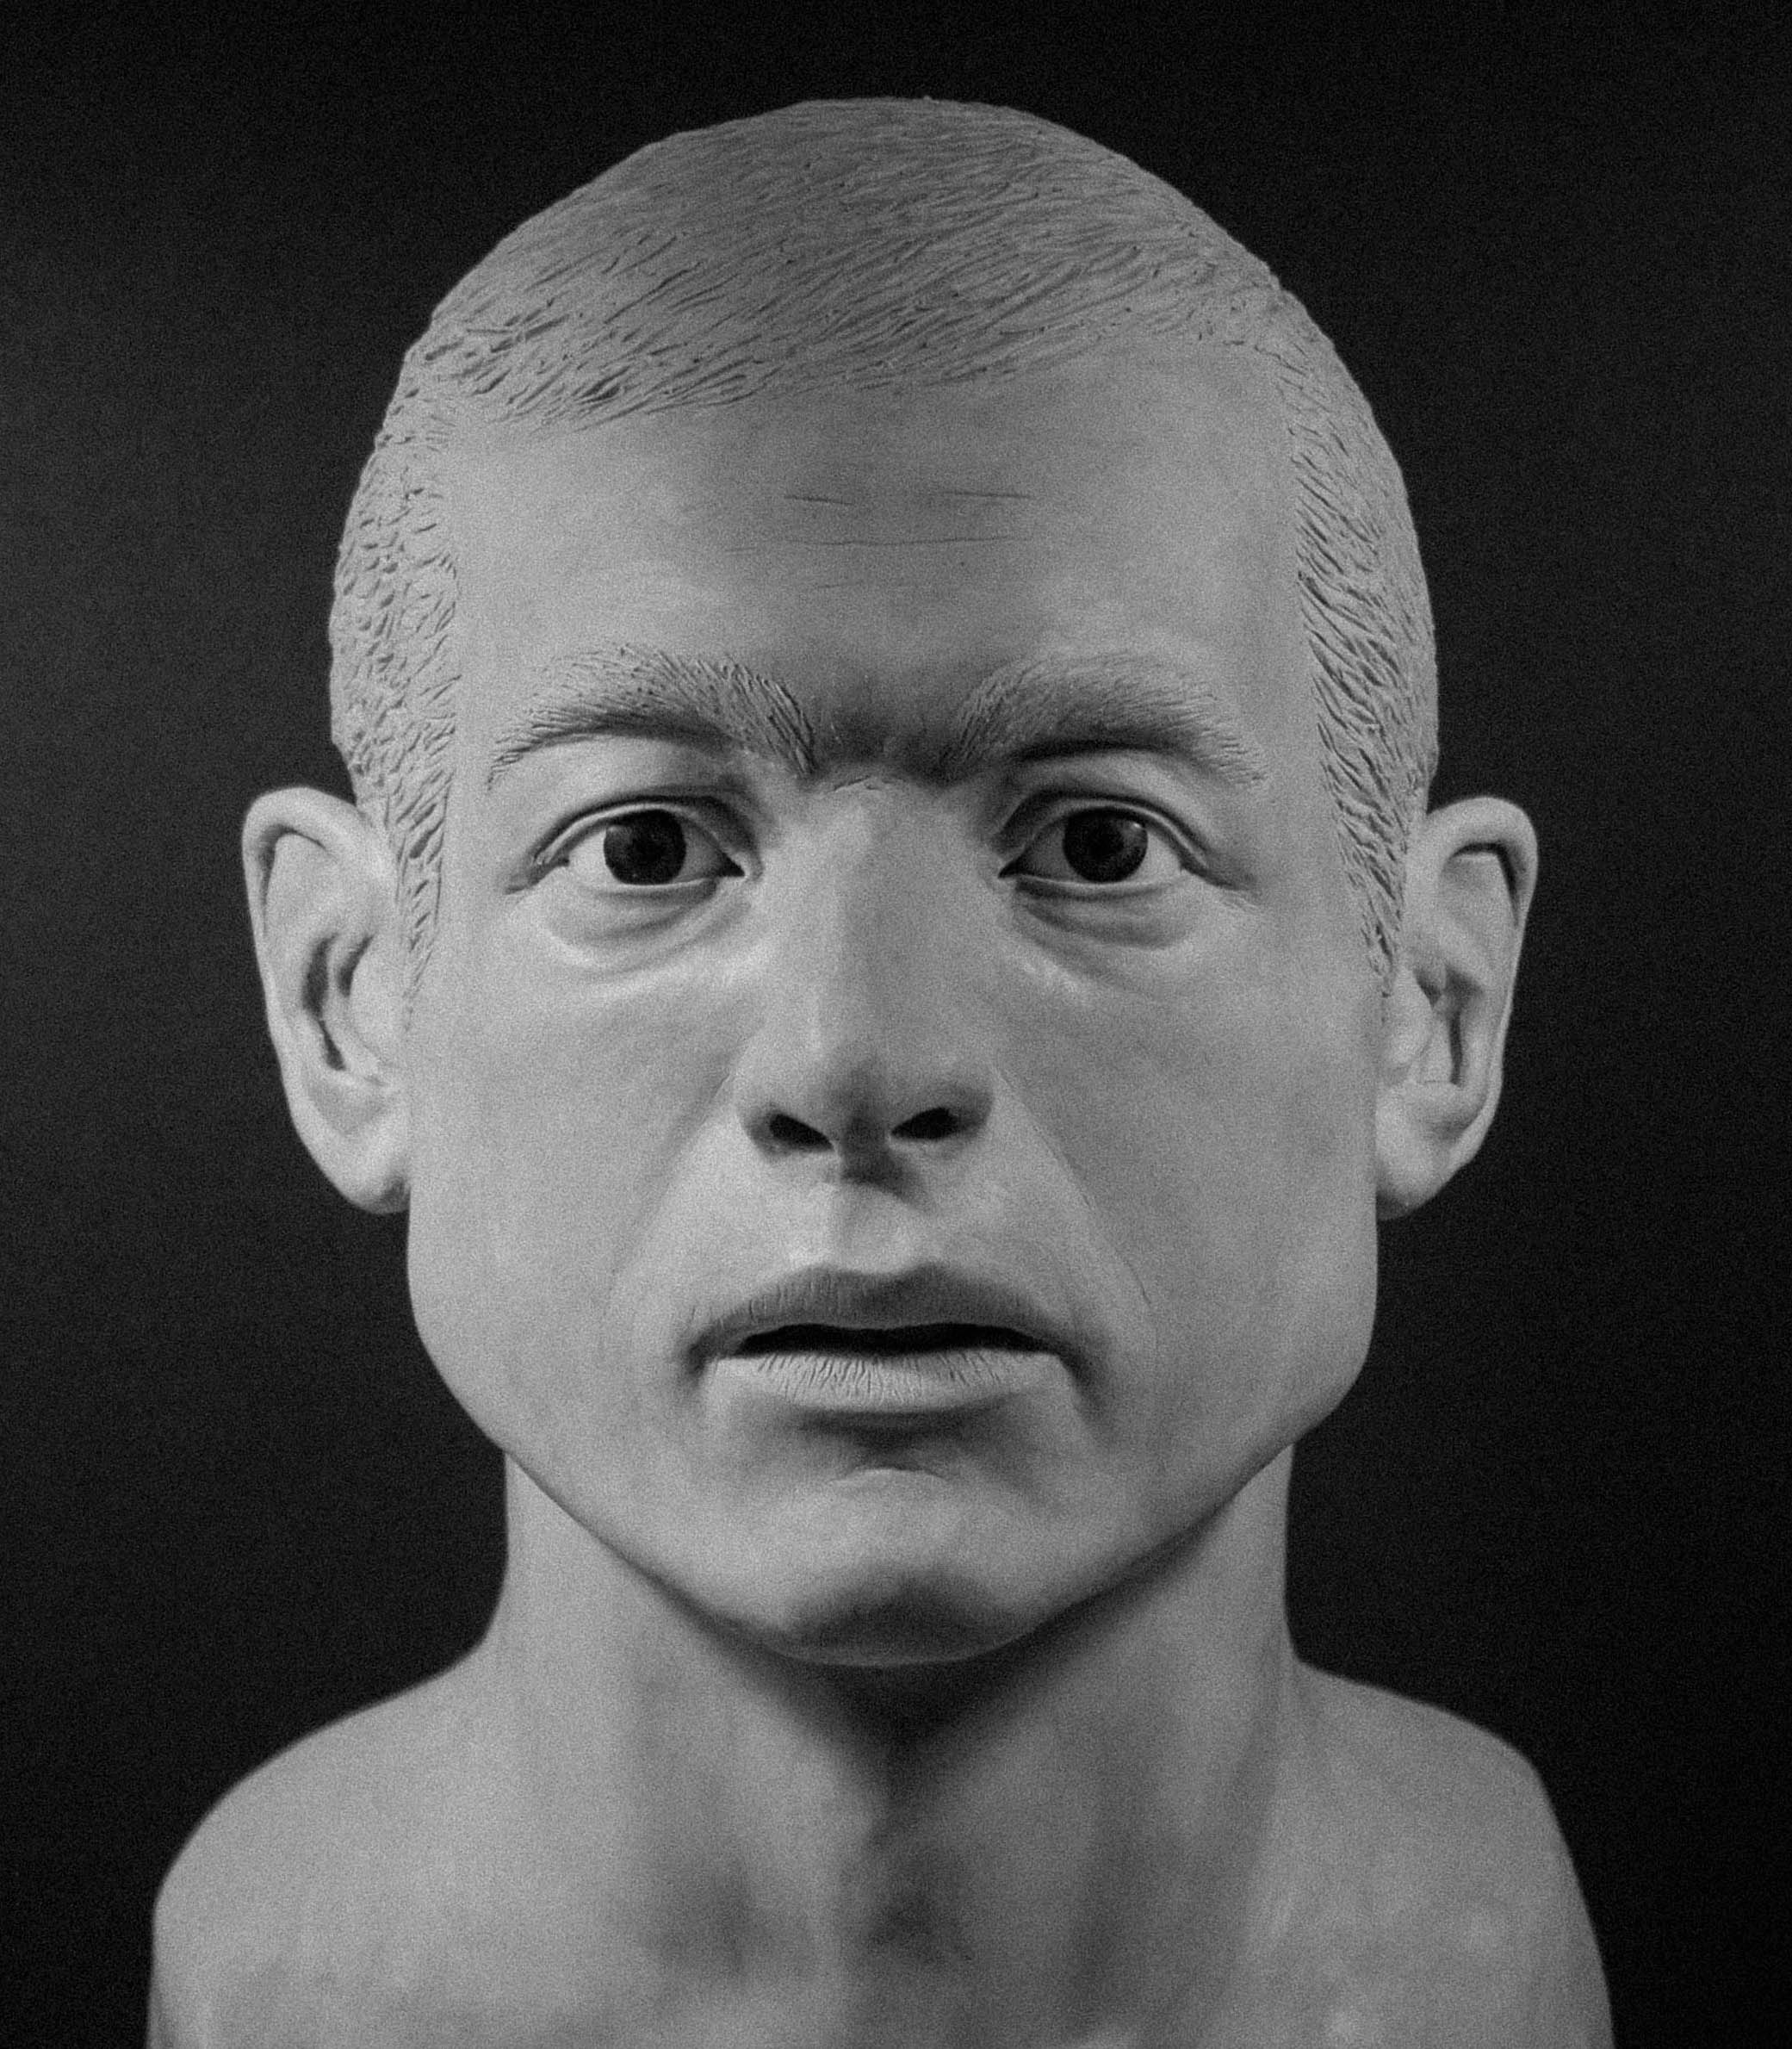 Boulder County John Doe (2017)